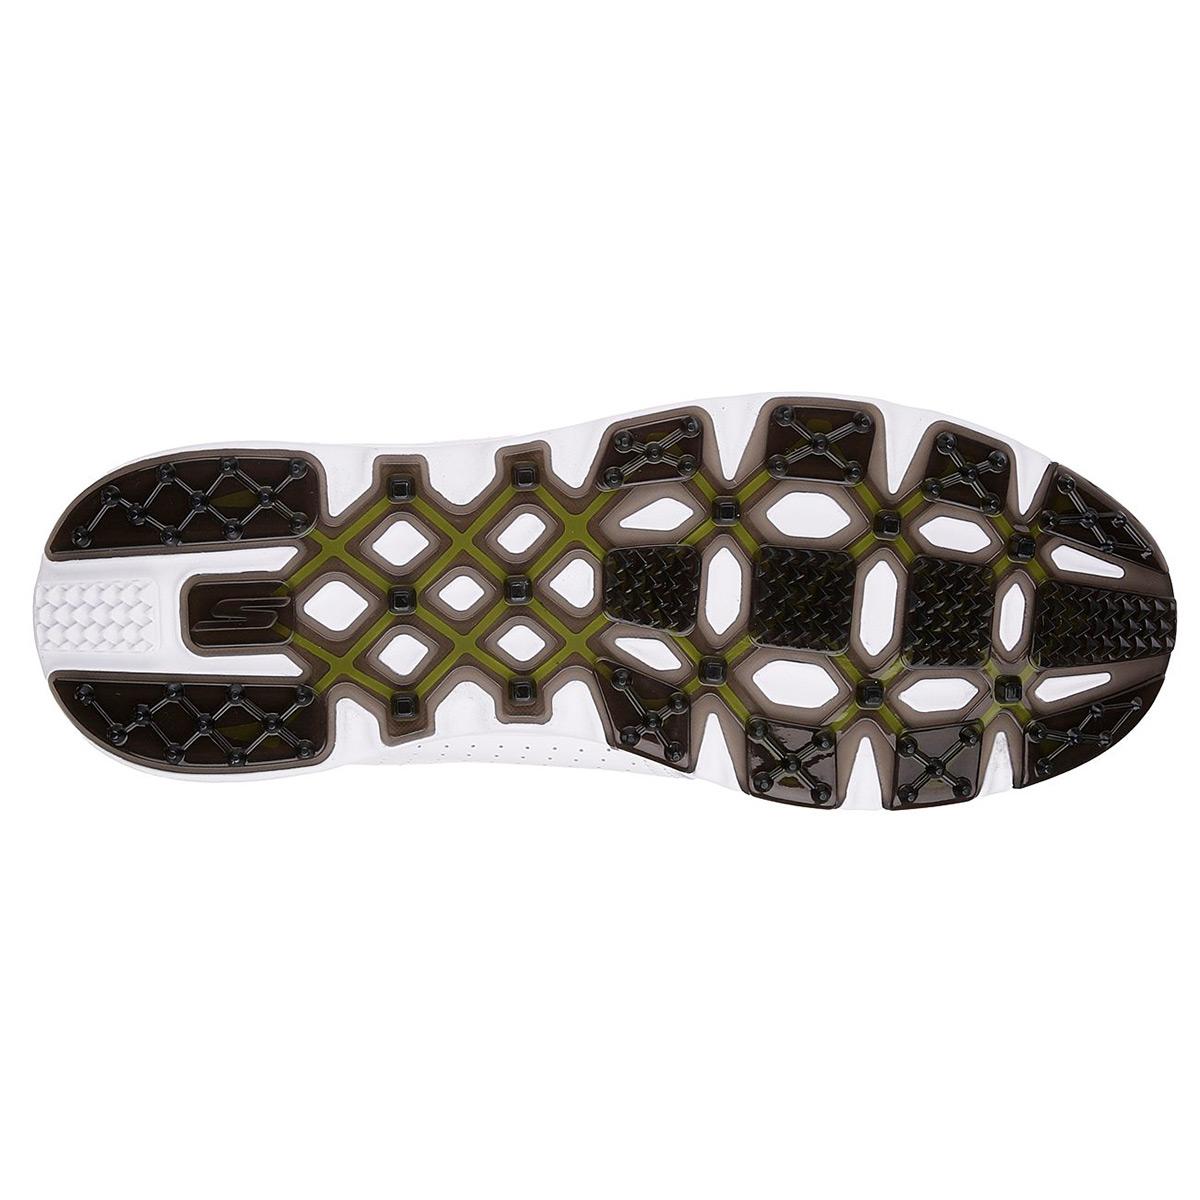 Skechers-Golf-Mens-2019-Go-Elite-V-3-Spikeless-Waterproof-Leather-Golf-Shoes thumbnail 15